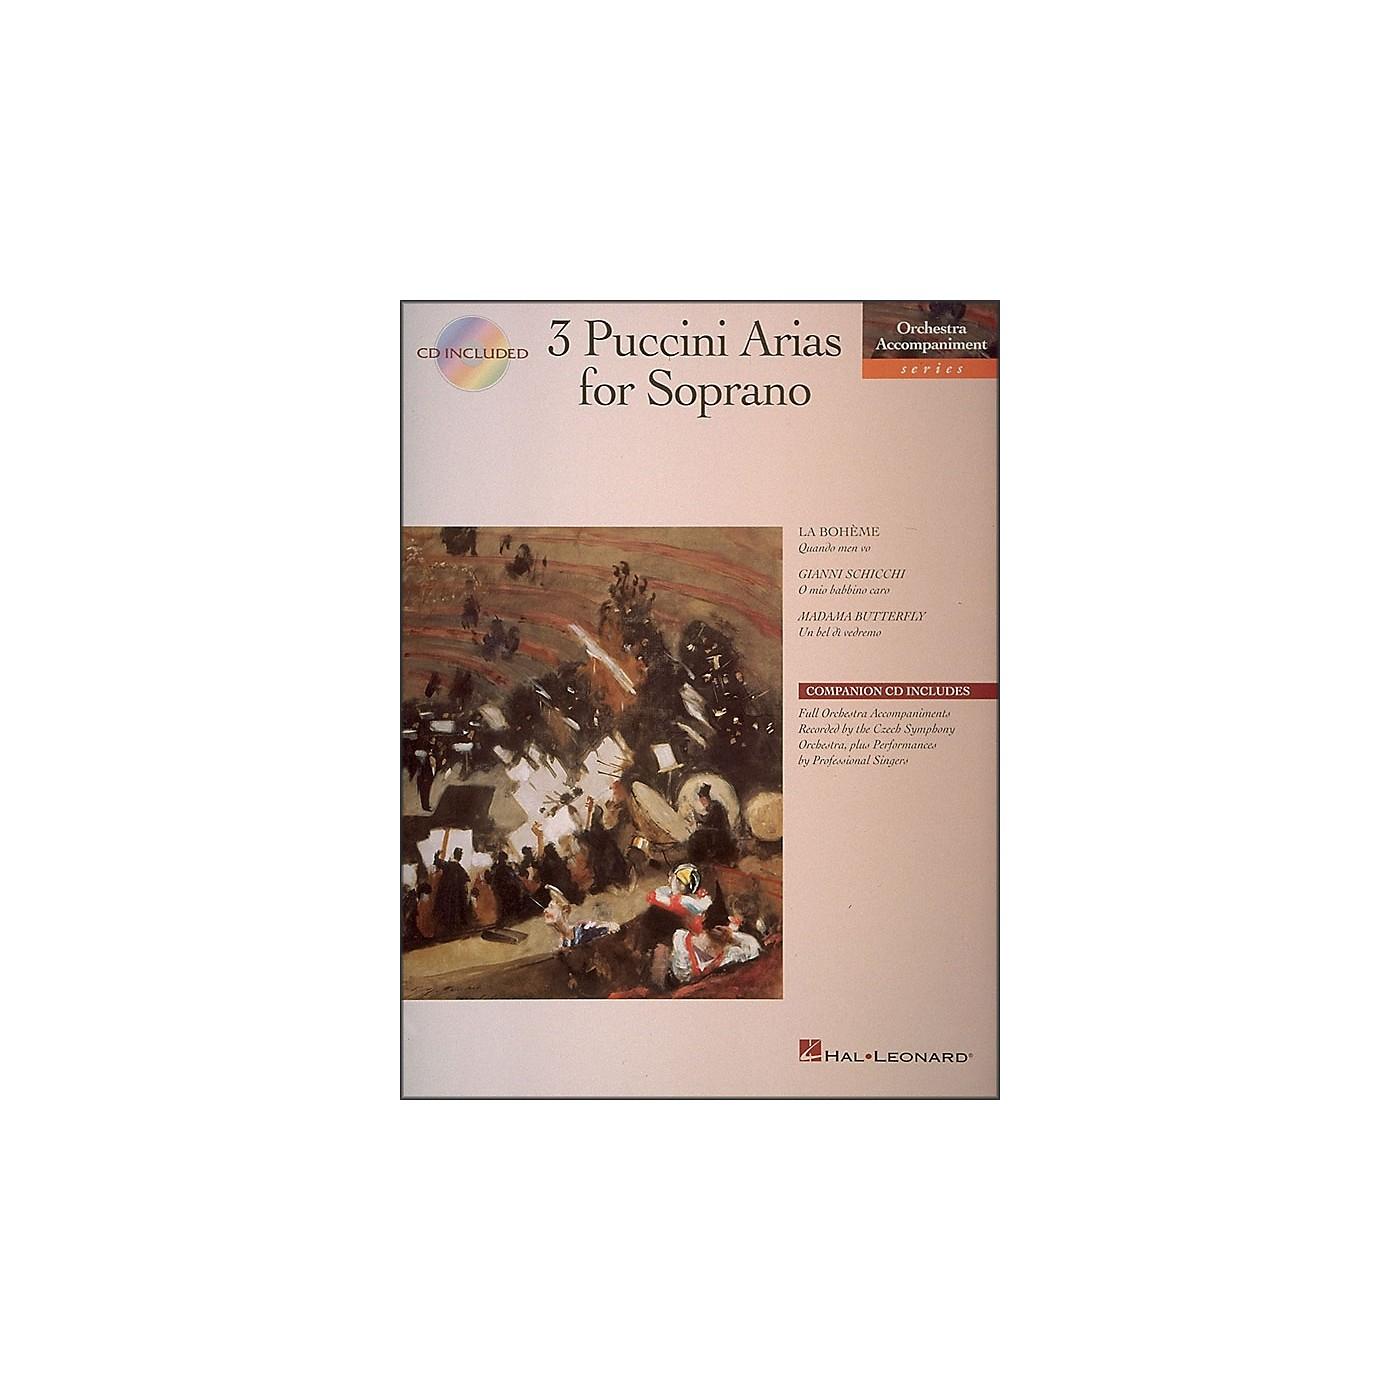 Hal Leonard 3 Puccini Arias for Soprano Book/CD Pkg thumbnail